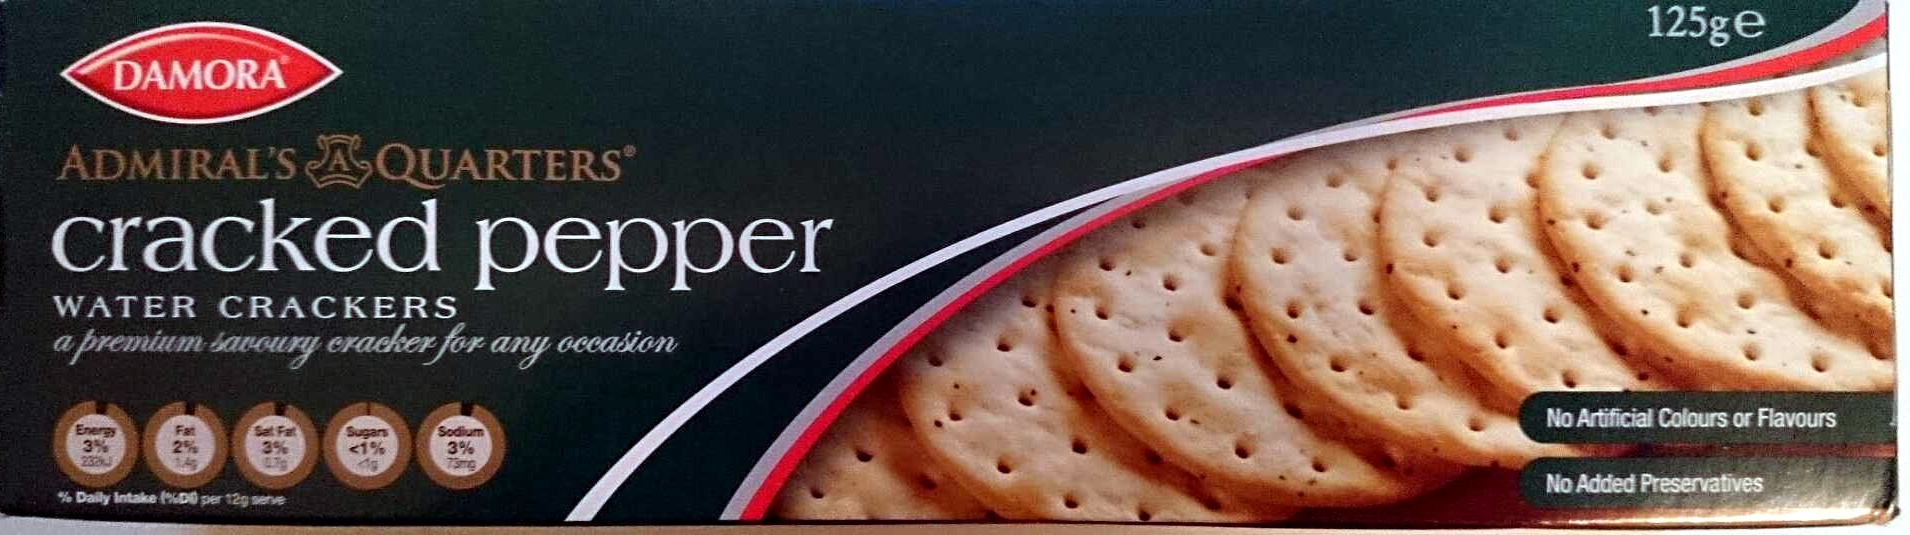 Cracked Pepper Water Crackers - Product - en